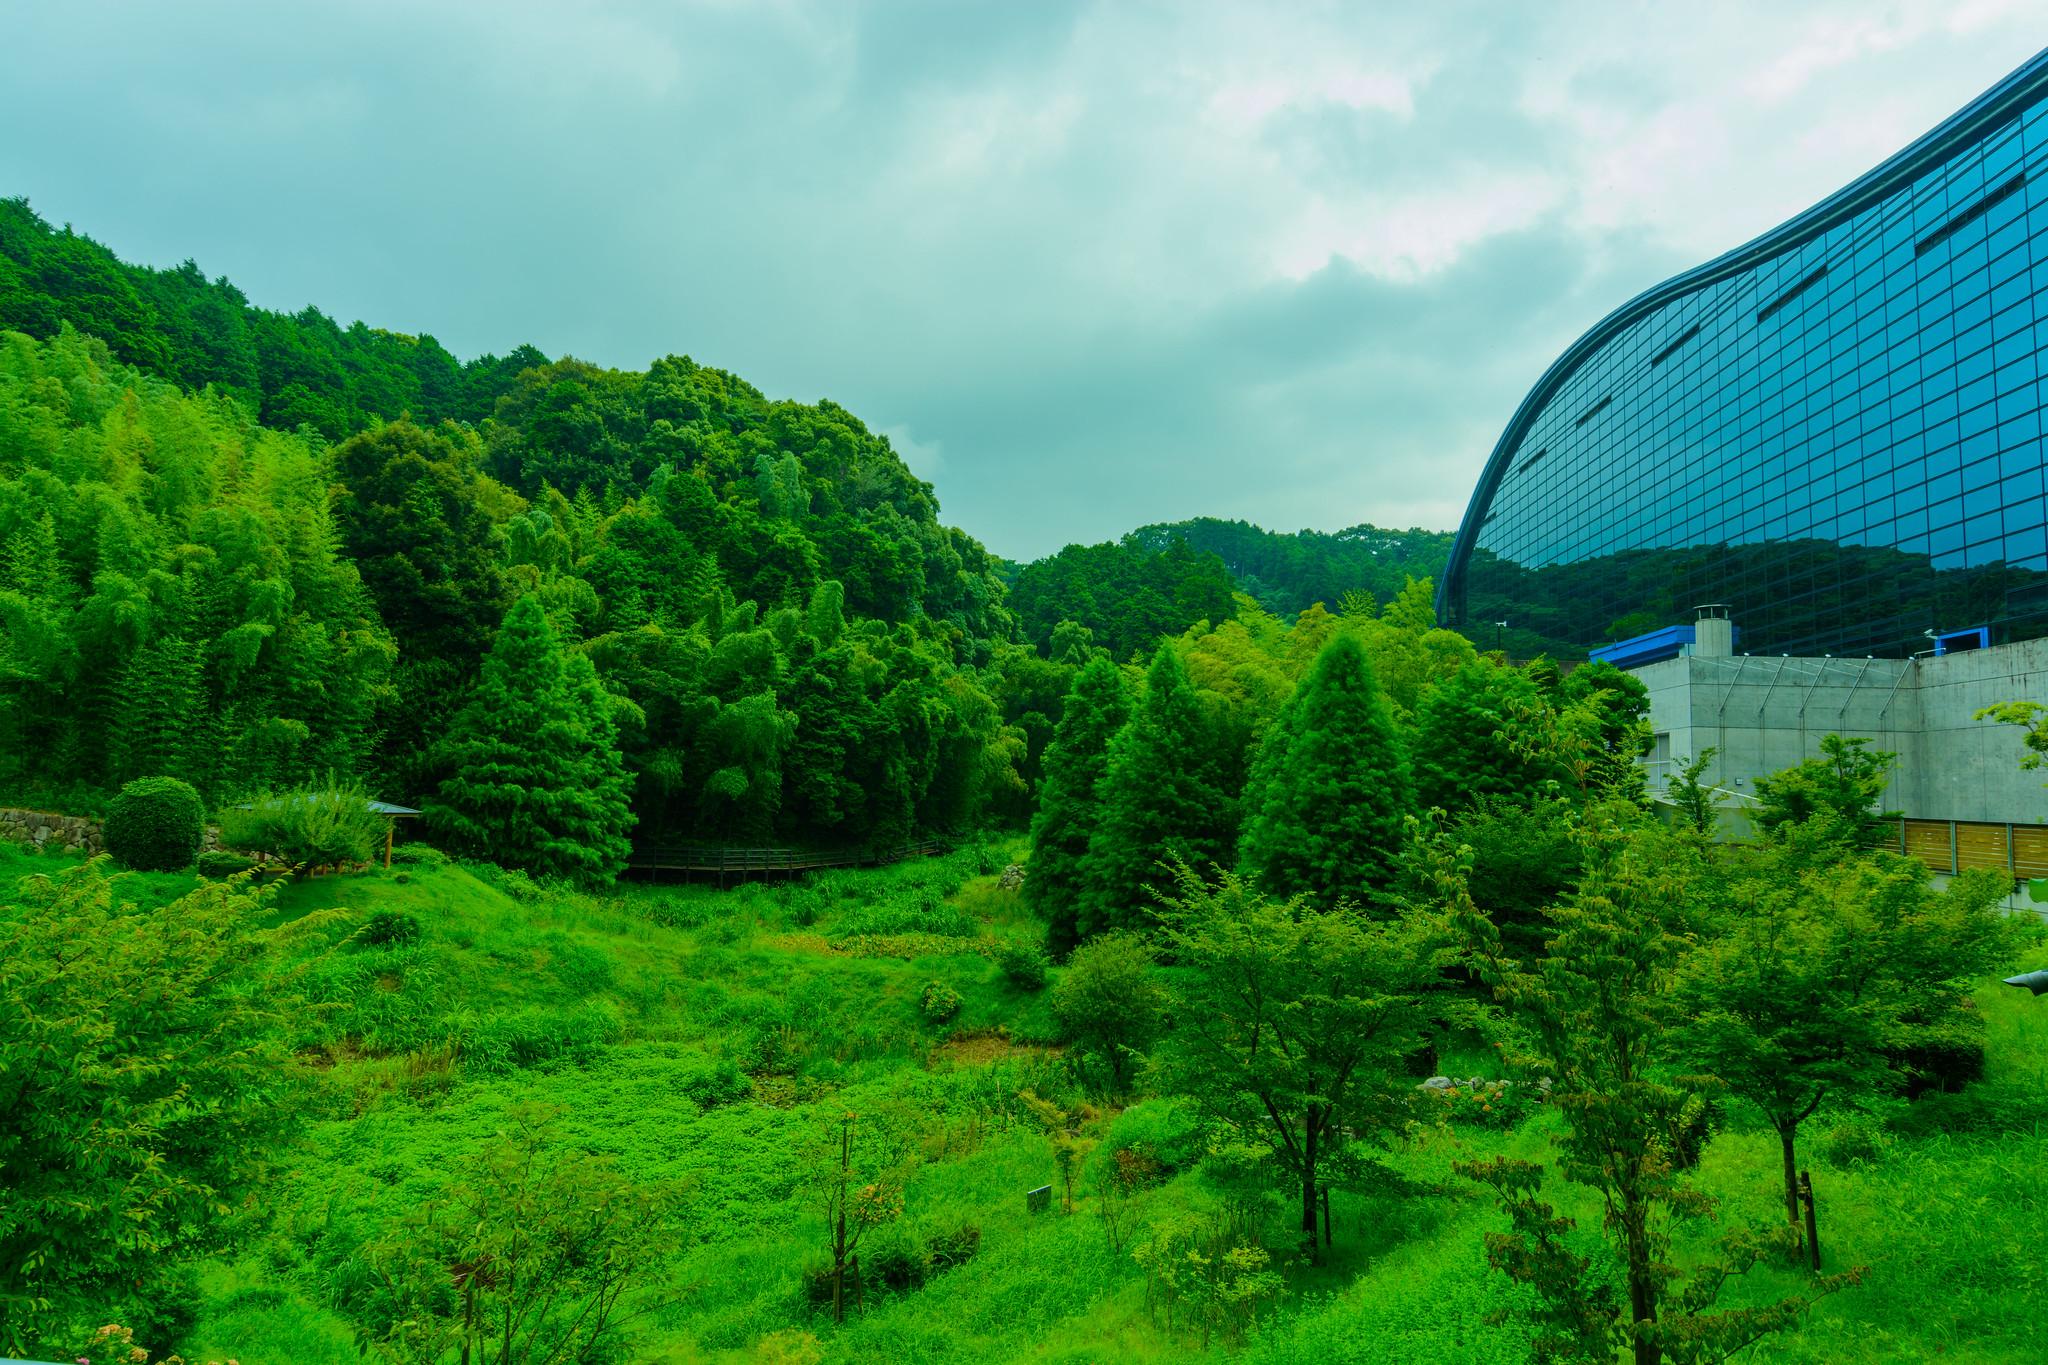 10 Things to do in Fukuoka, Japan 8